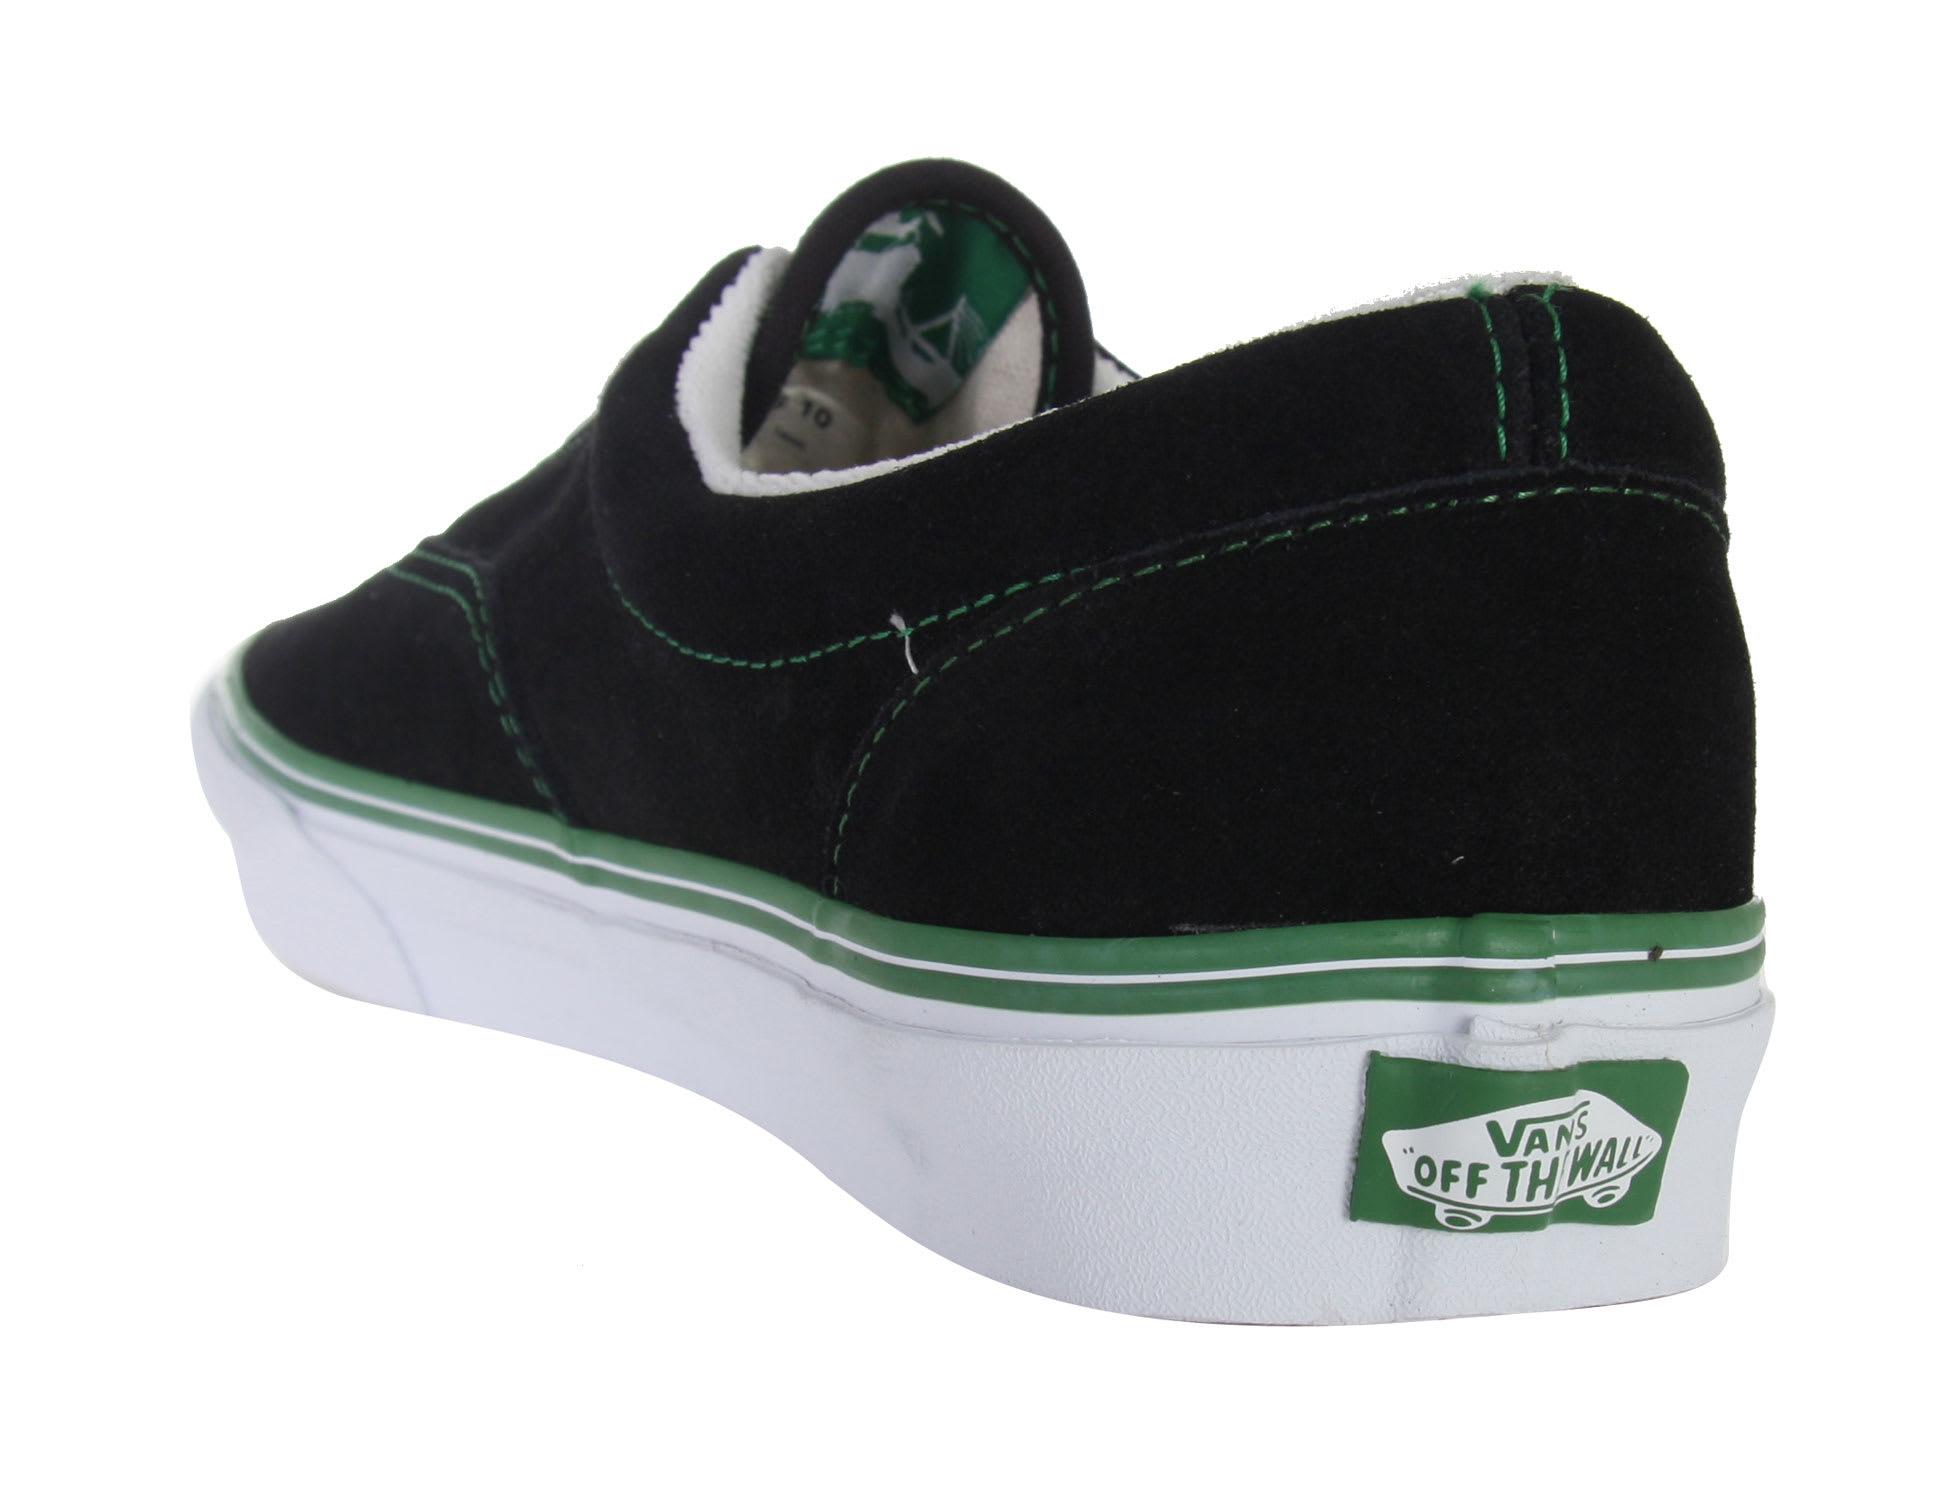 34e456d749 Vans Era Skate Shoes - thumbnail 2